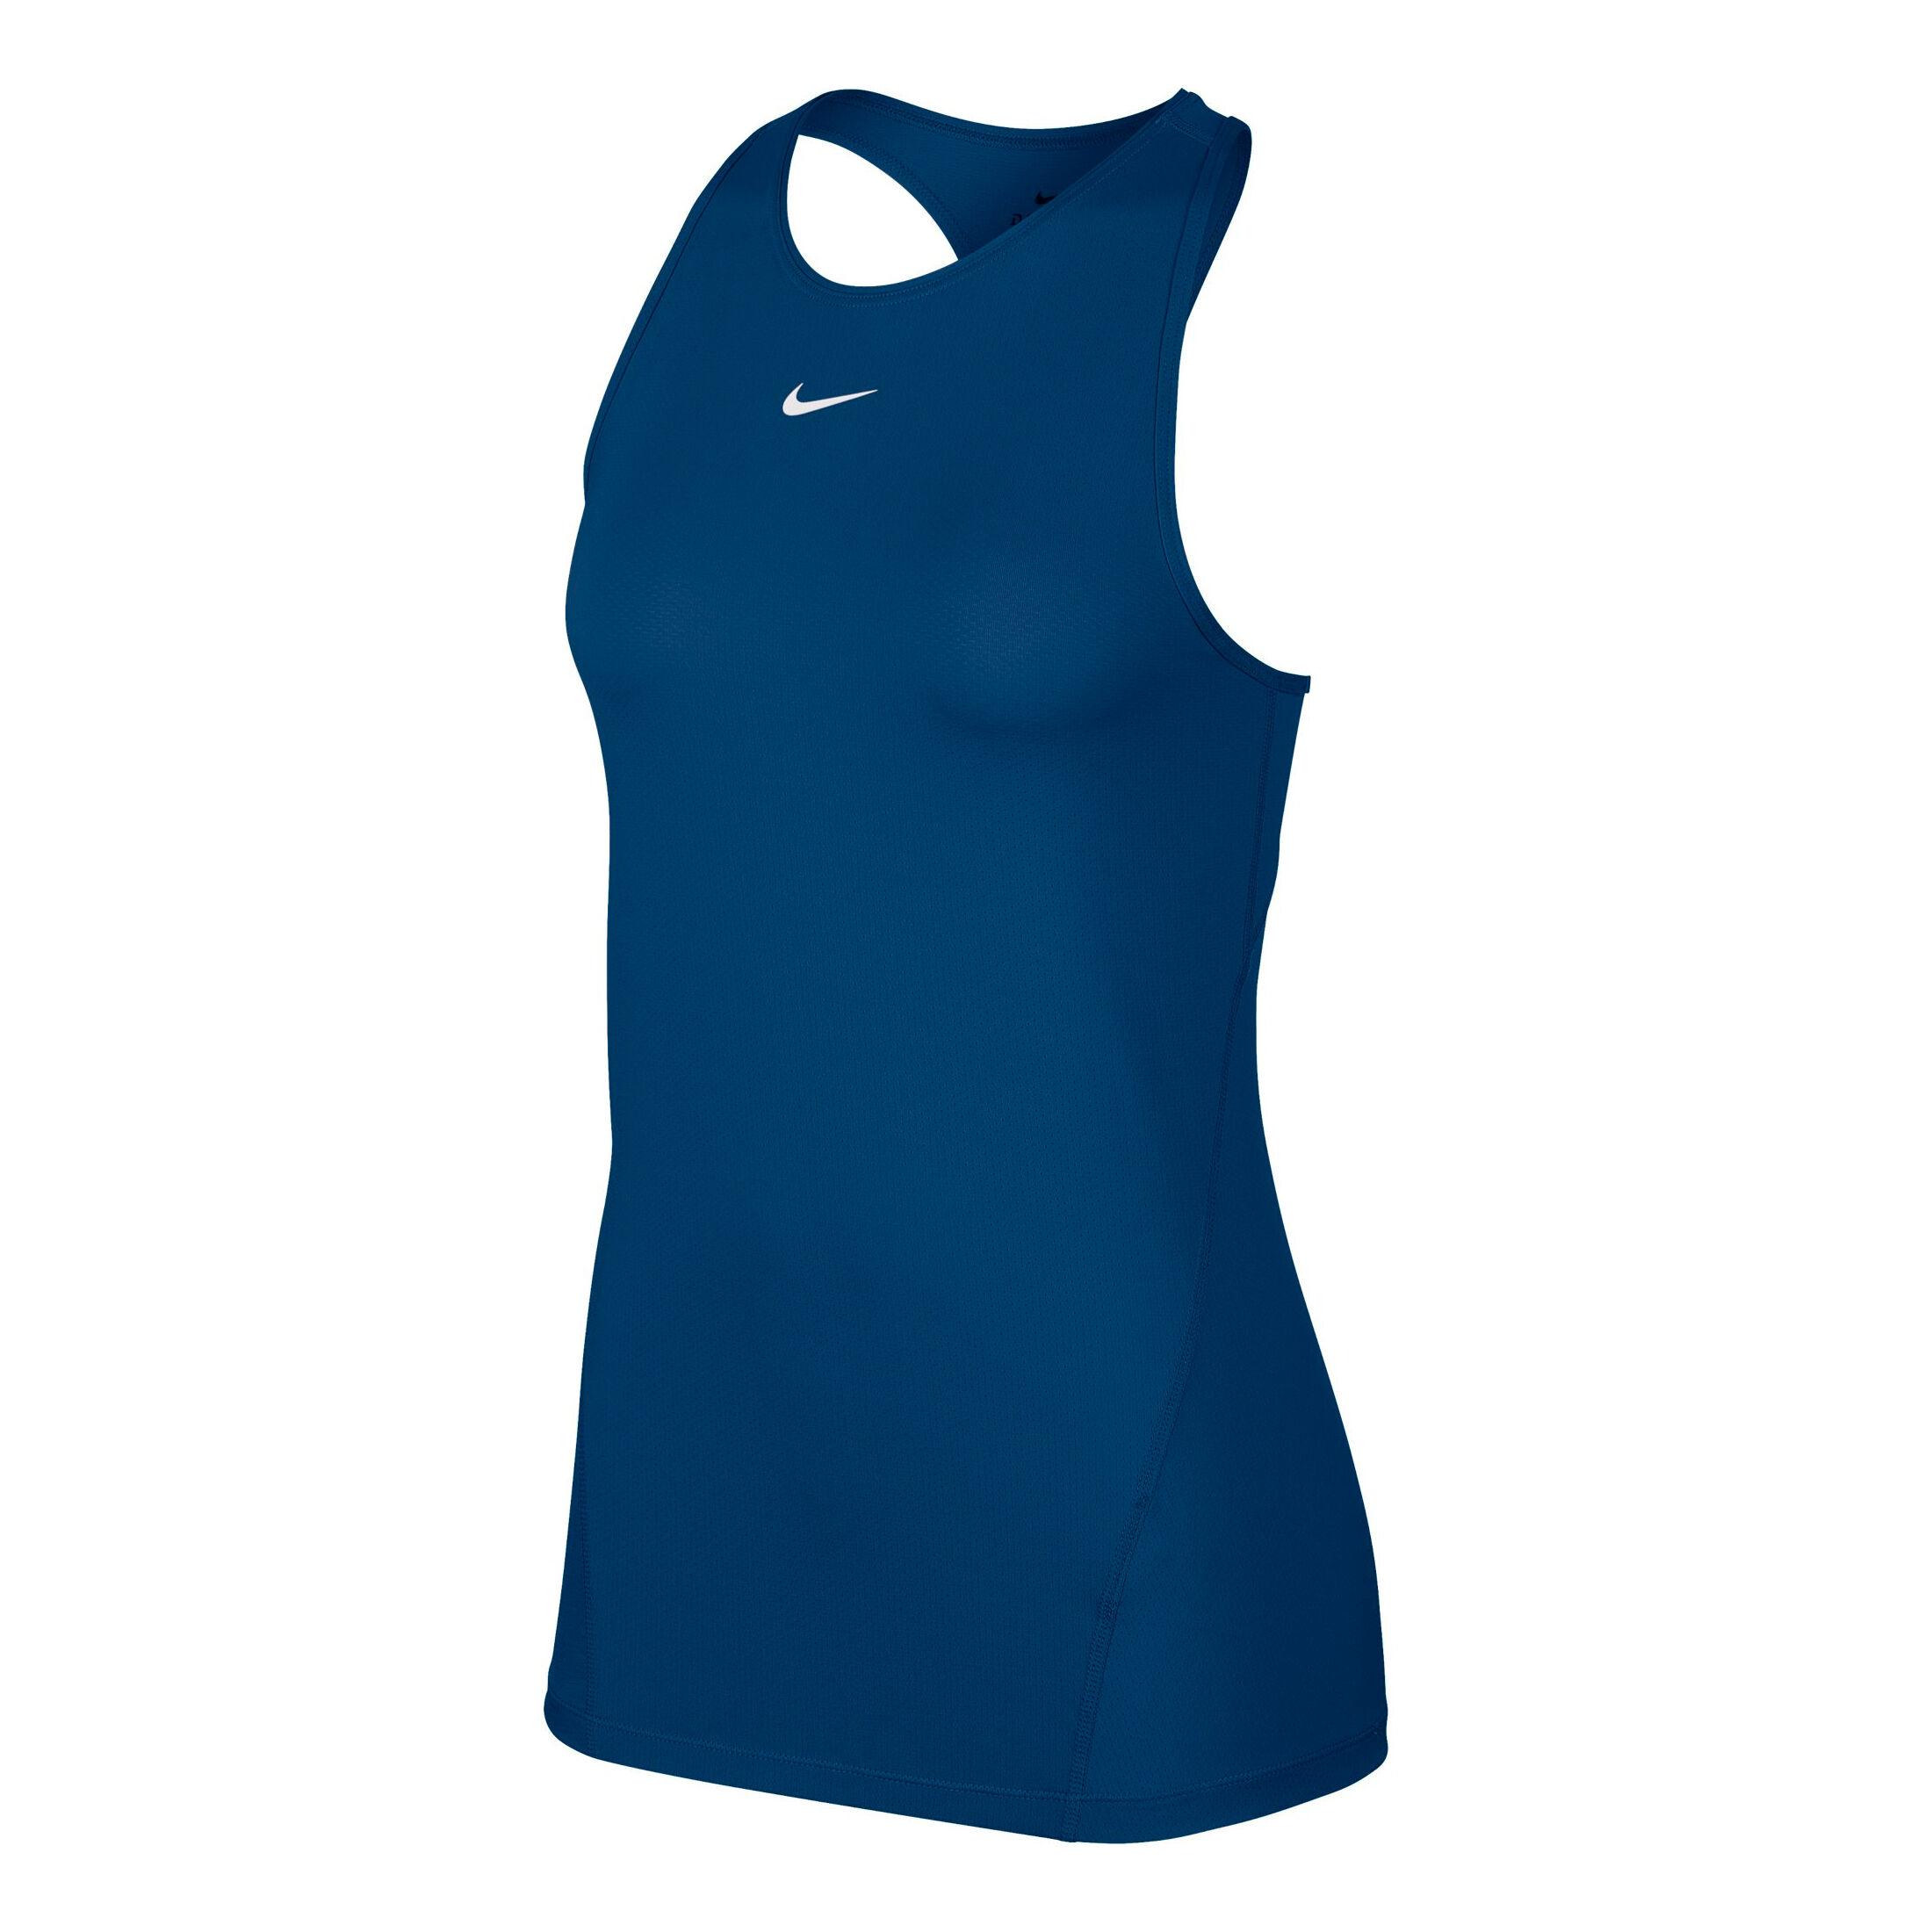 Nike Pro Tank Top Damen Petrol, Weiß